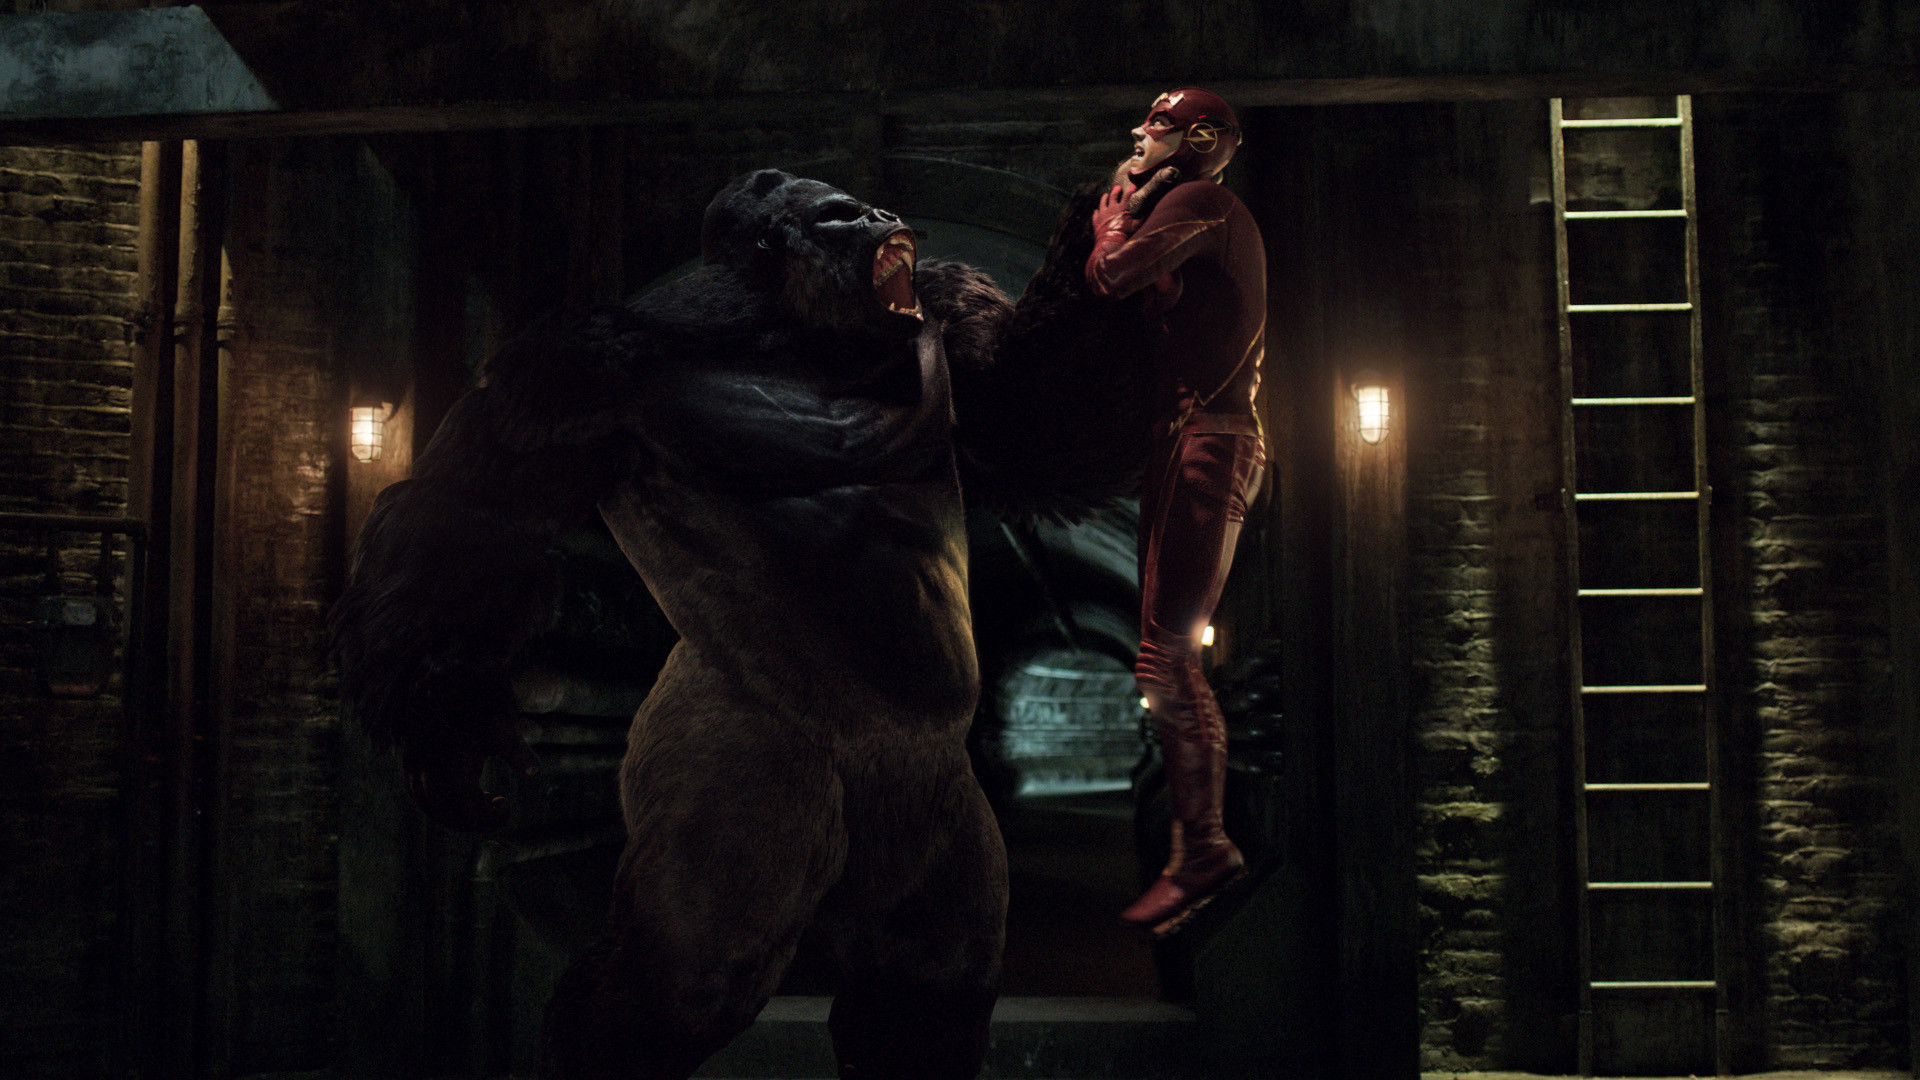 'Legends Of Tomorrow' Season 3 Adds Gorilla Grodd, Bizarro Leonard Snart  [SPOILERS]